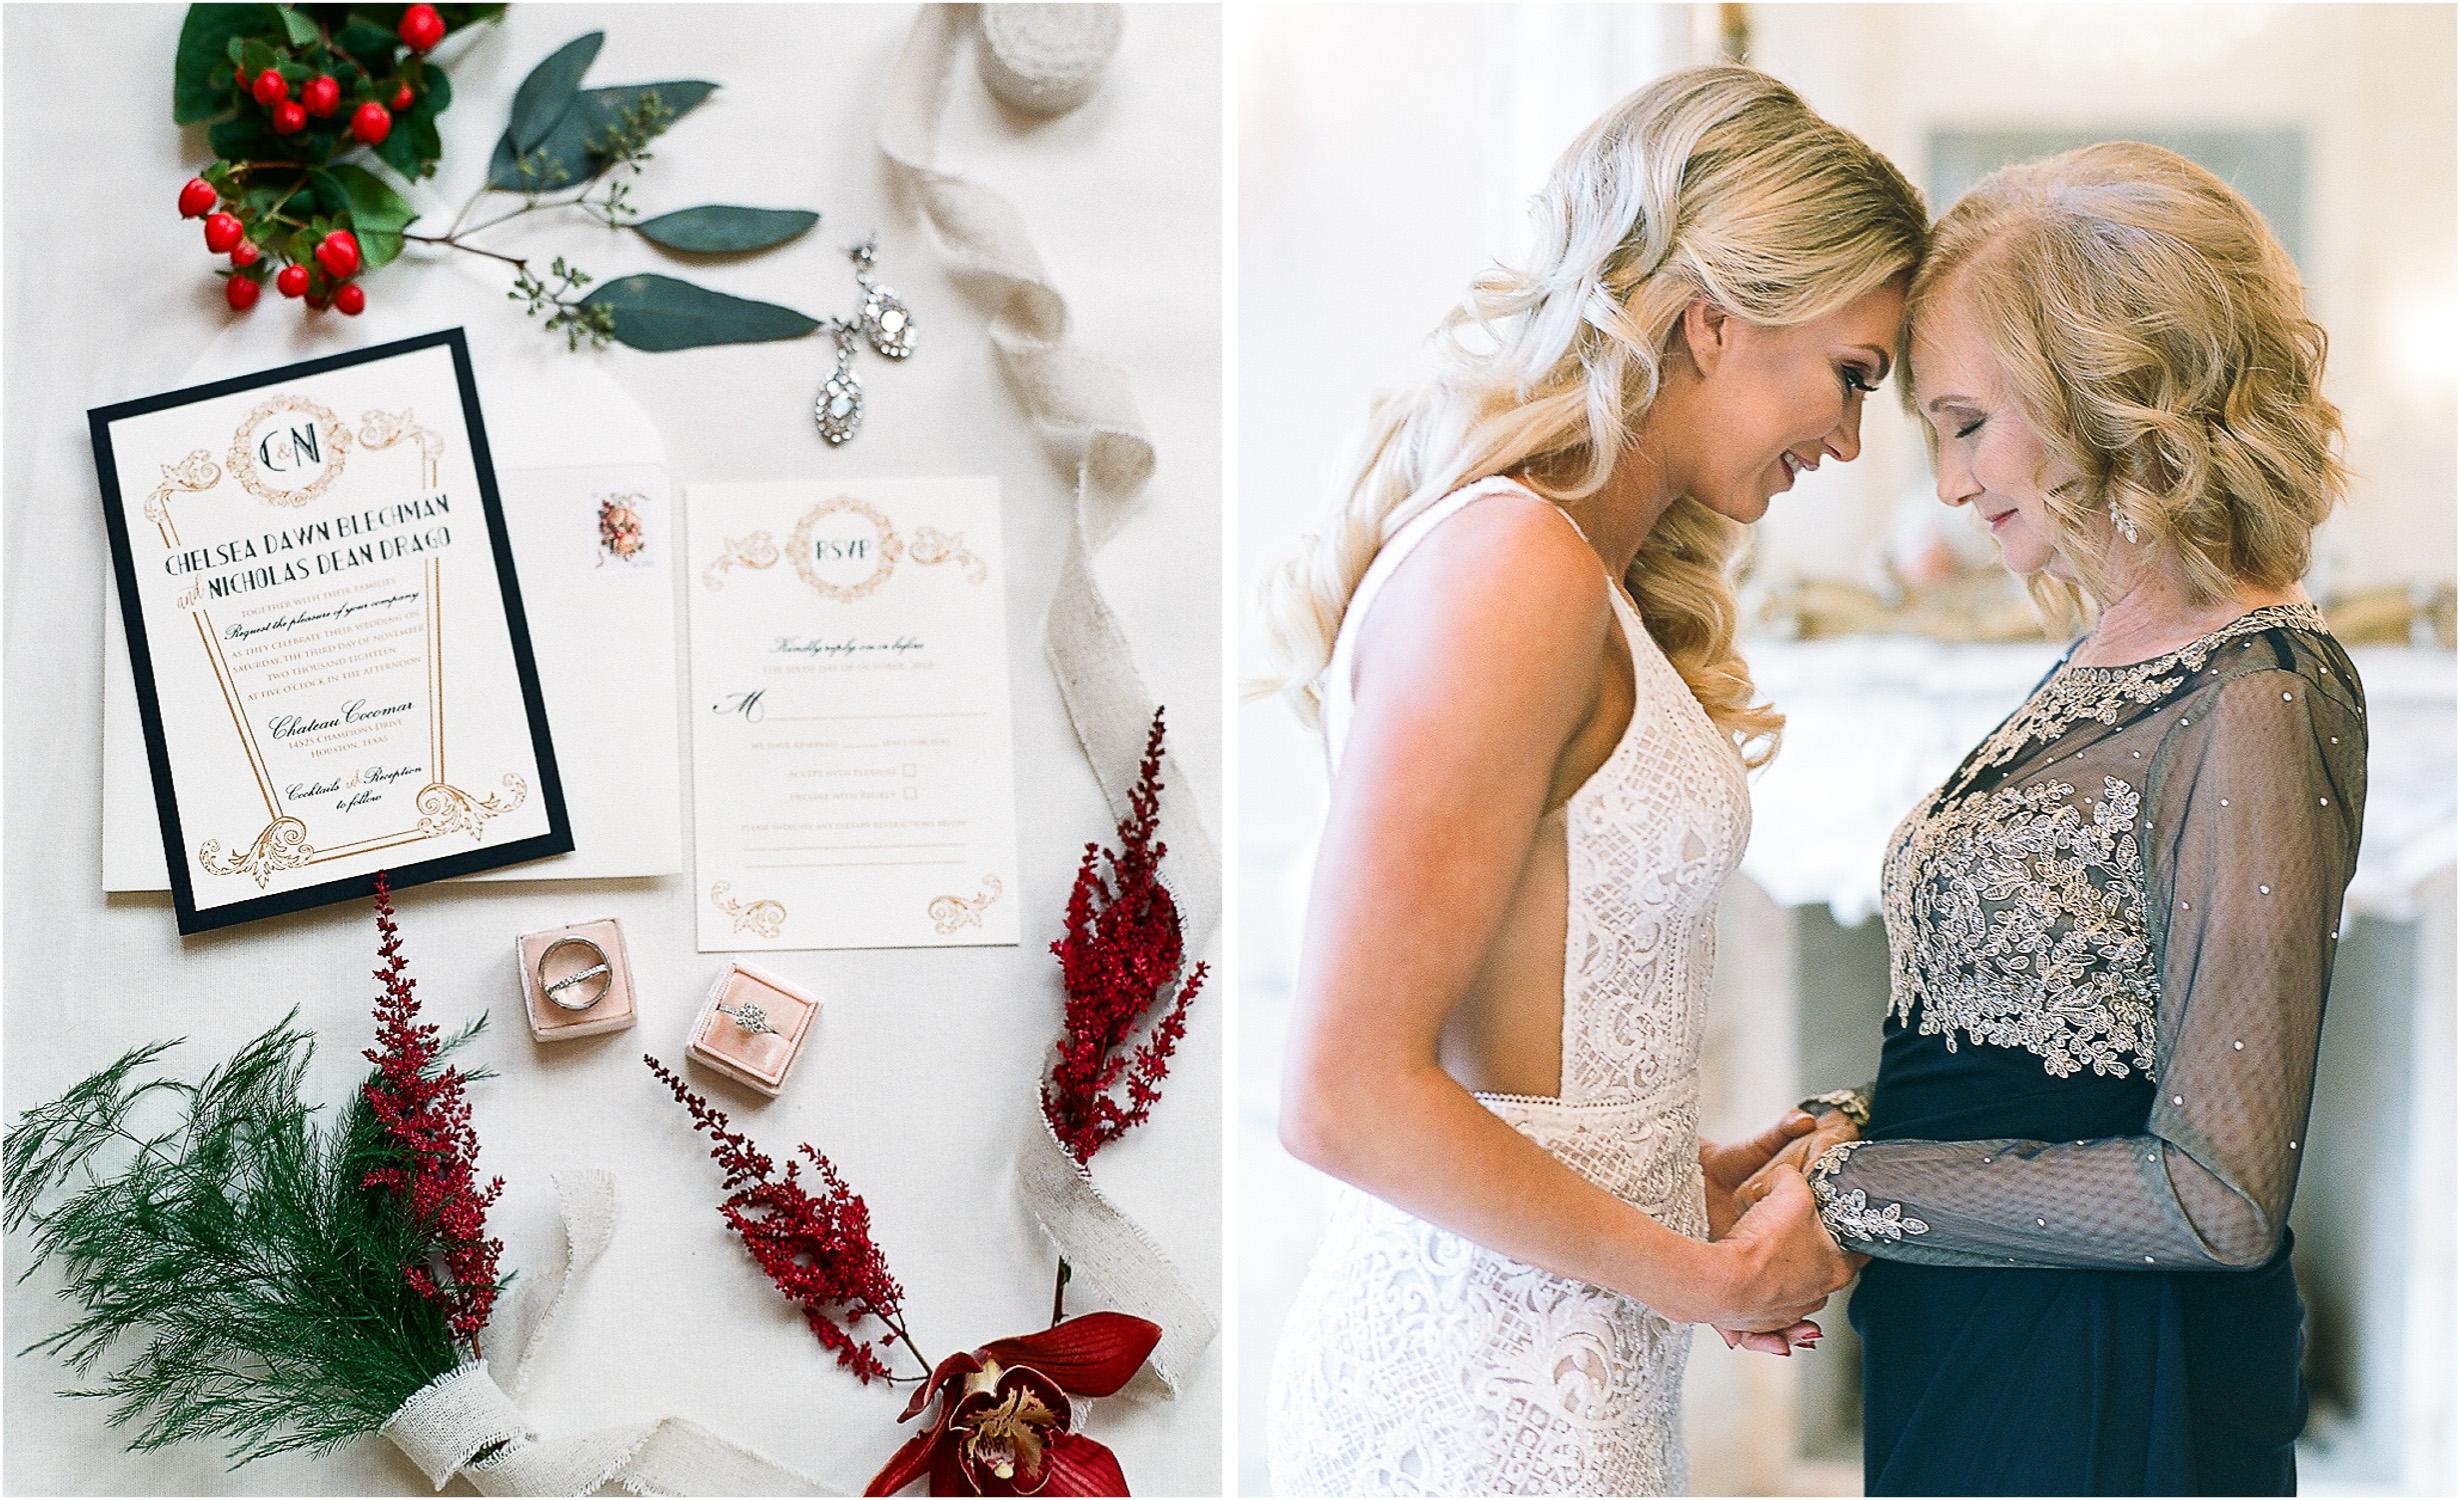 Bonphotage Texas Fine Art Wedding Photography